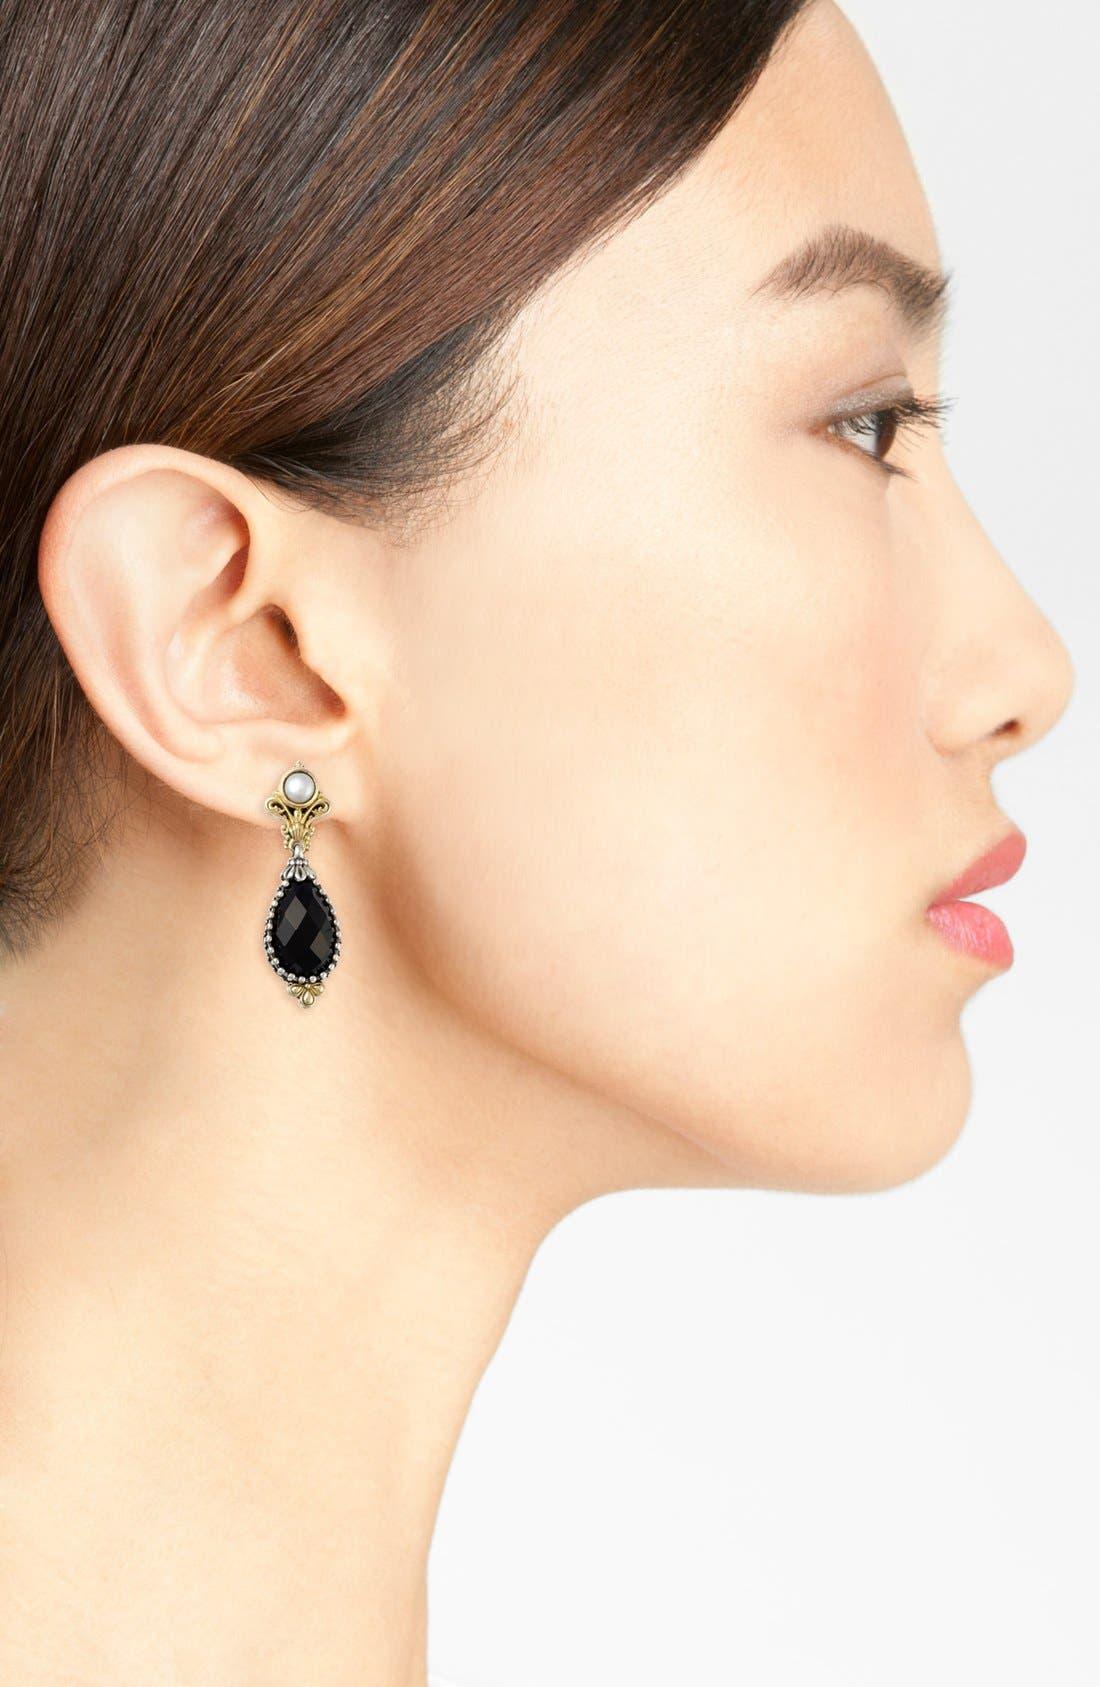 'Nykta' Pearl & Black Onyx Drop Earrings,                             Alternate thumbnail 2, color,                             SILVER/ GOLD/ PEARL